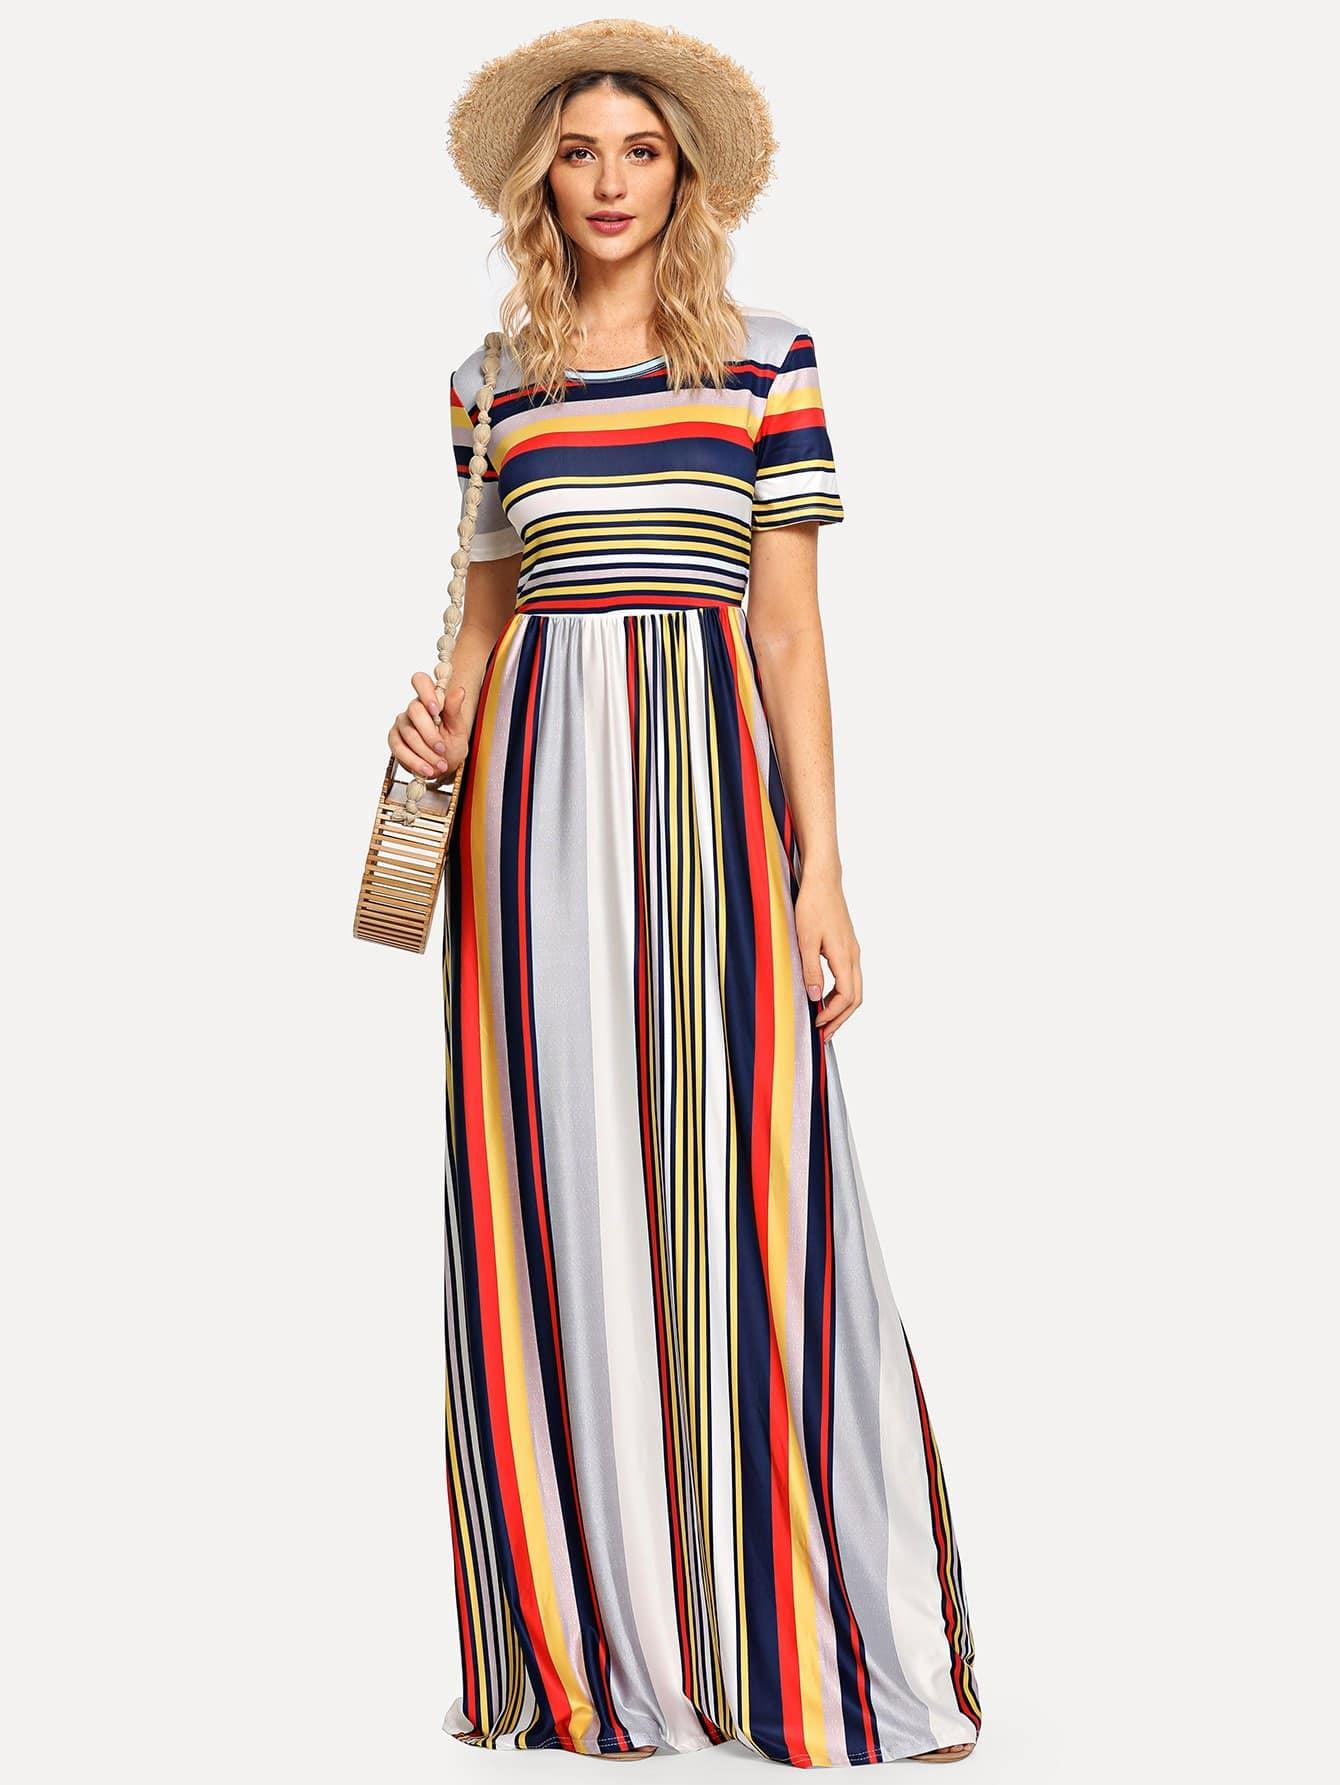 Scoop Neck Striped Dress scoop neck striped stretchy dress